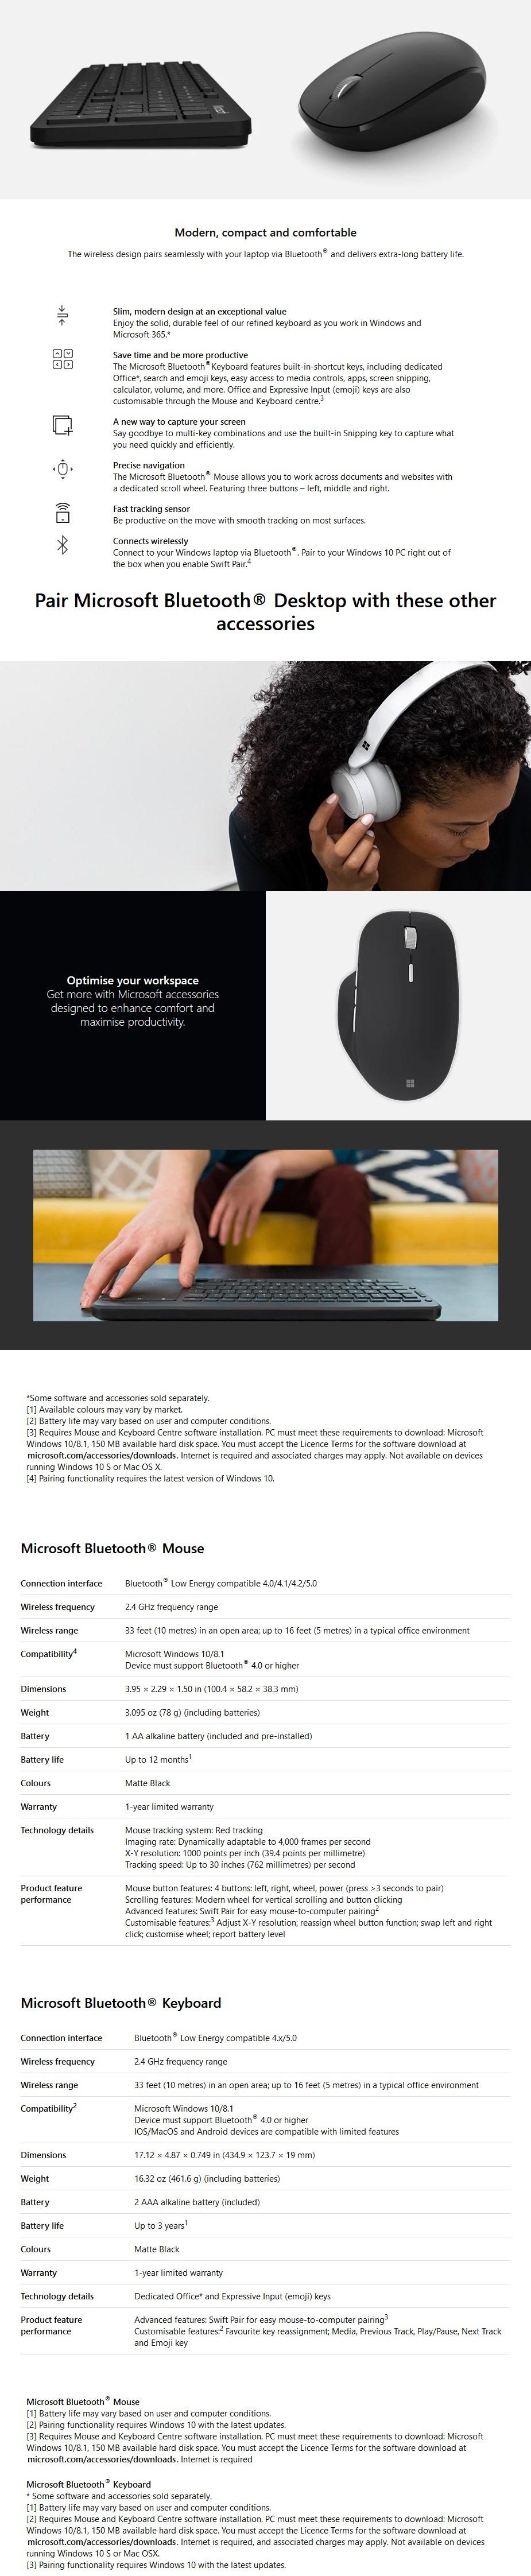 microsoft_qhg00017_bluetooth_desktop_mouse_keyboard_combo_ac35043_4.jpg